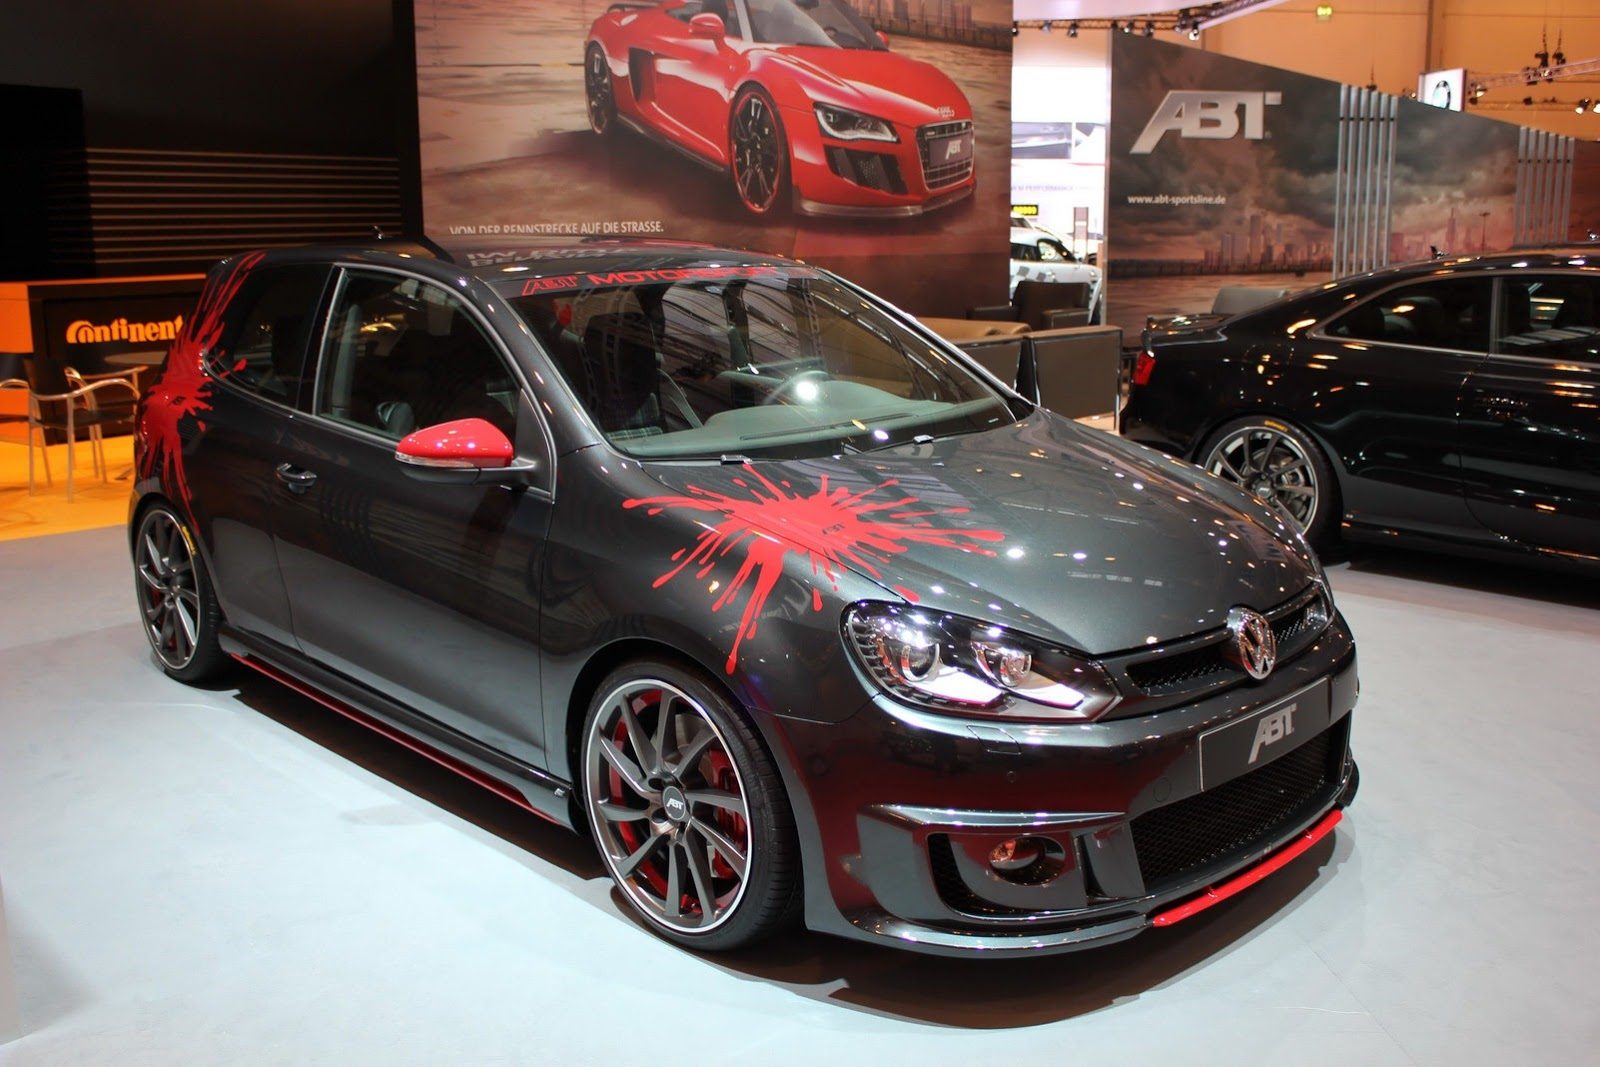 VW Golf GTI Mk6 Last Edition - Auto Trends Magazine